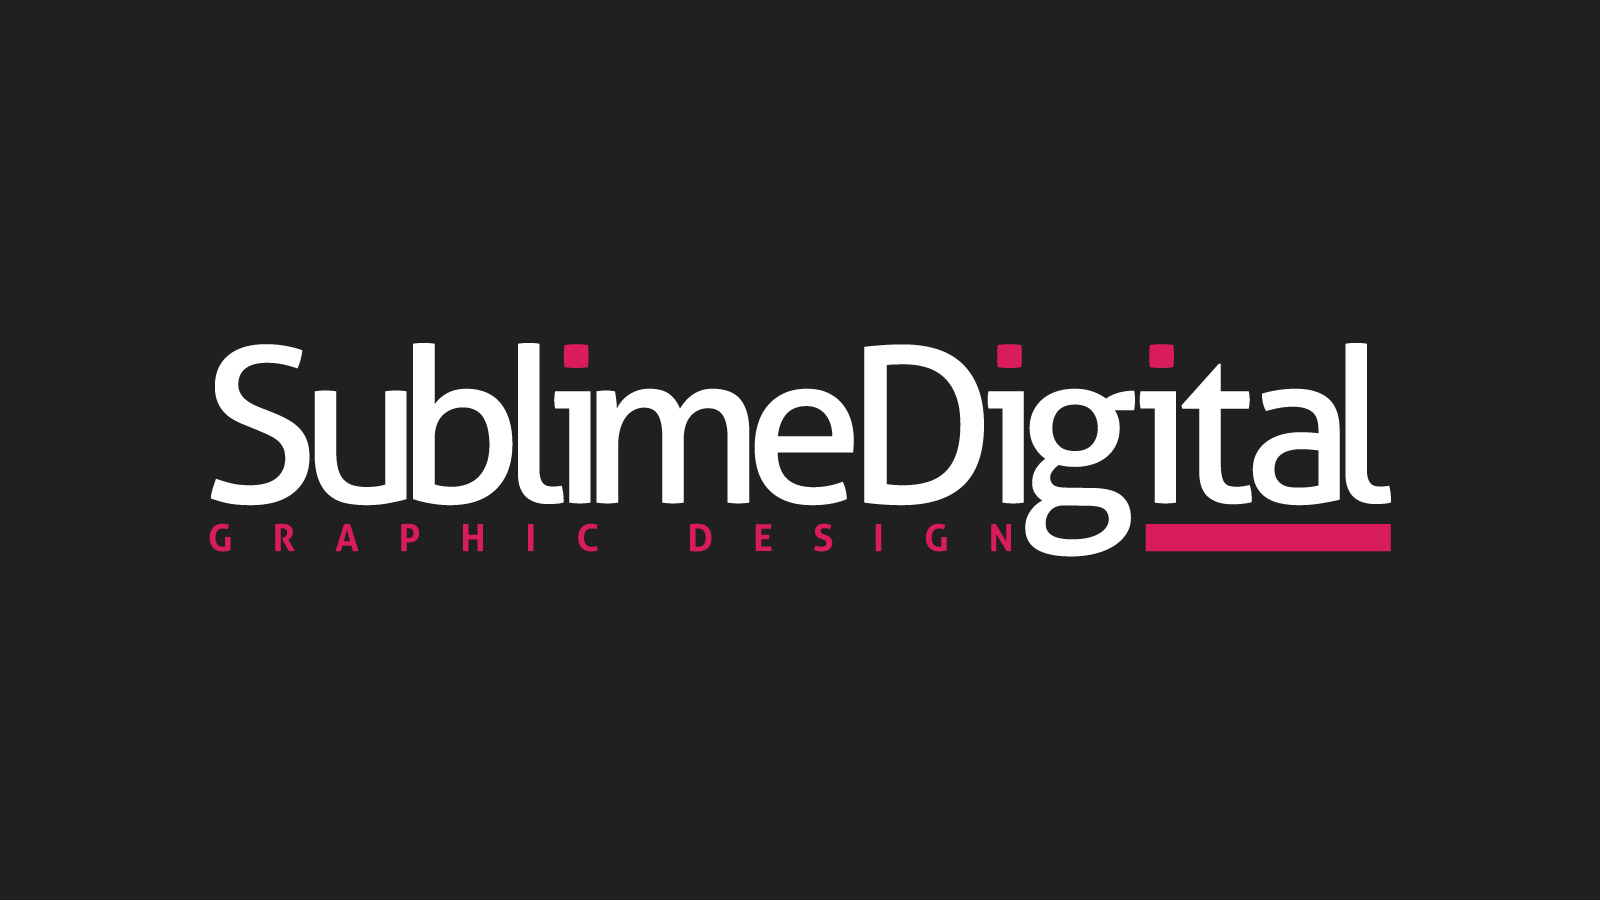 Sublime Digital • Sublime Digital Graphic Design logo design: sublime-digital.com/portfolio/sublime-digital-graphic-design